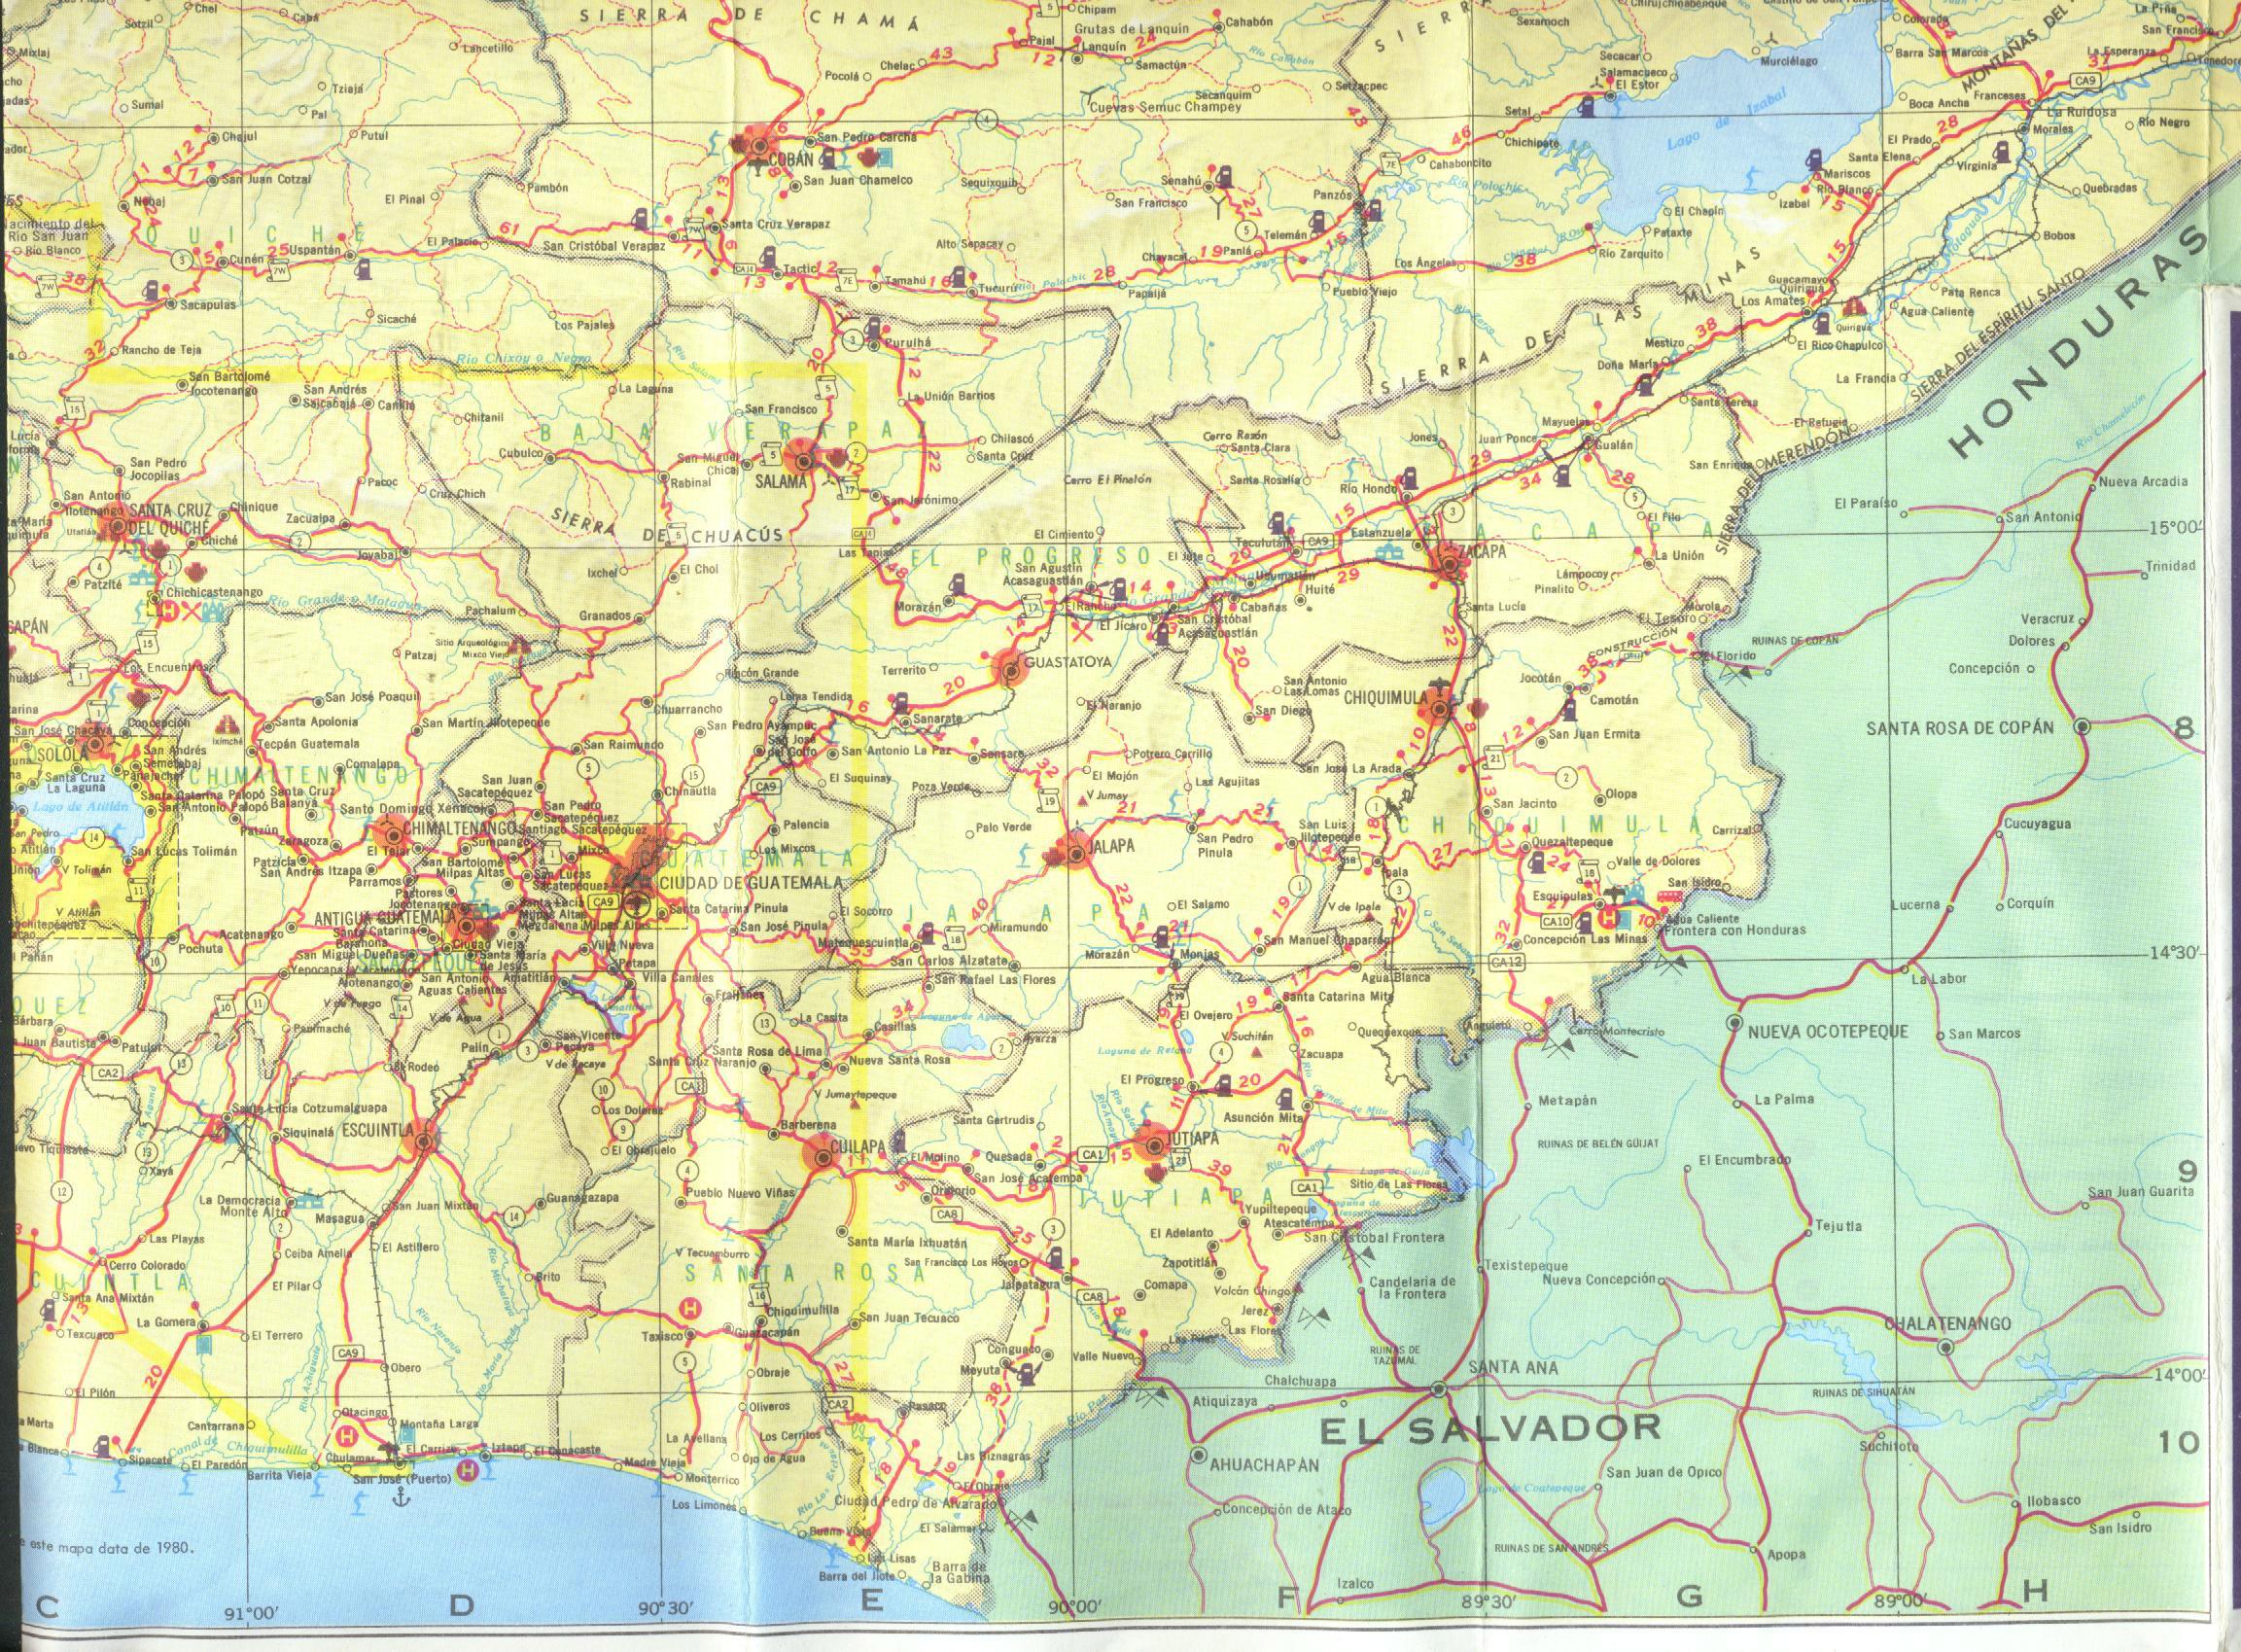 USA Map Free Us Road Maps Free Free Printable Images World Maps - East coast usa highway map